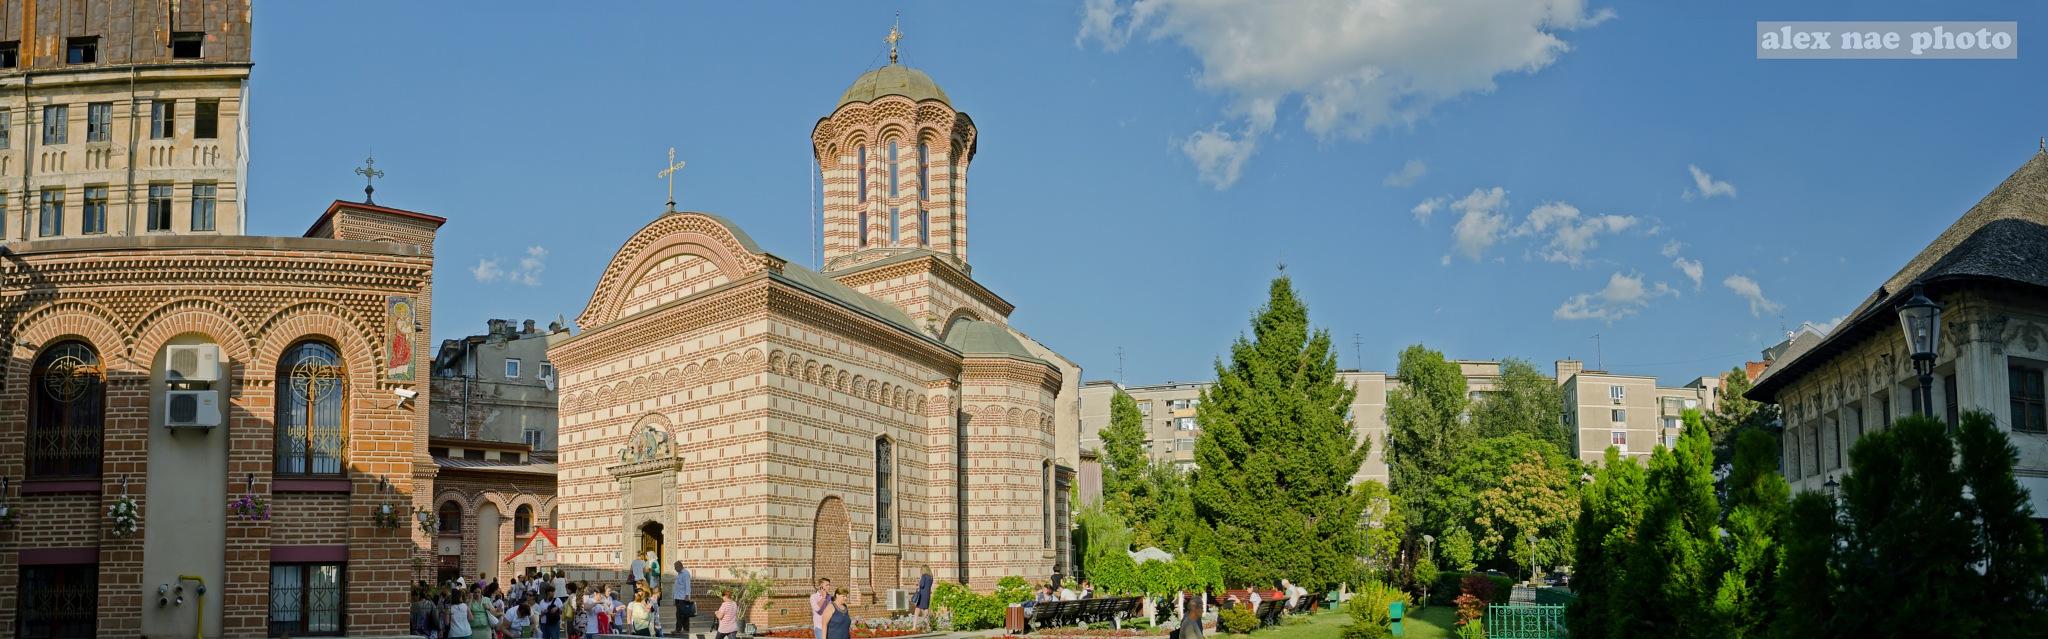 Church of Saint Anthony, Bucharest, Romania! by alexandru nae